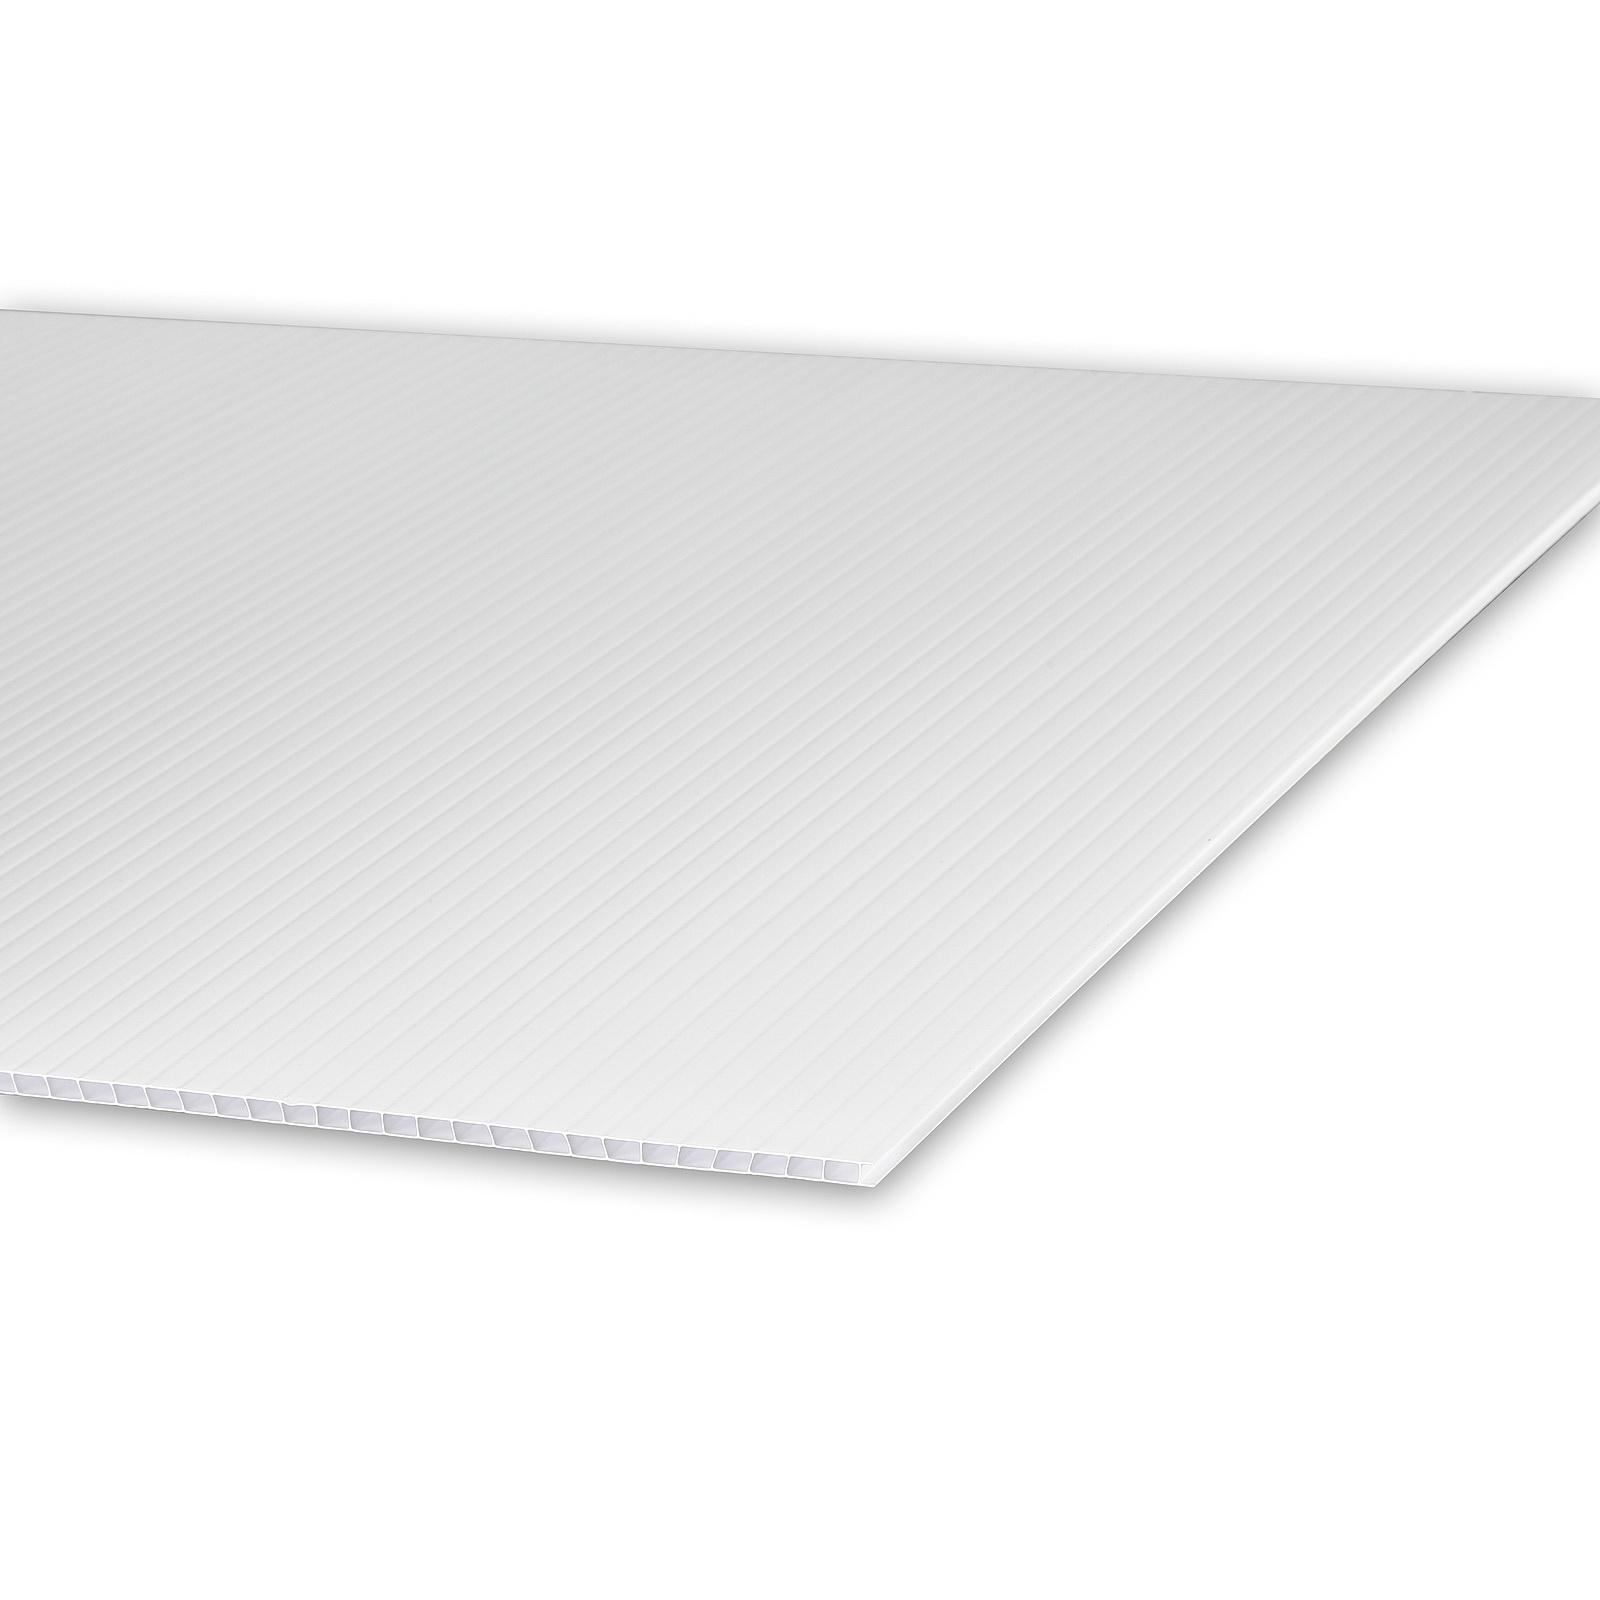 (1) 12''W x 18''H x 4mm White Corrugated Plastic Board and (1) Economy Stakes 10'' x 30'' (SKU: CB12-18W x ESS1030)